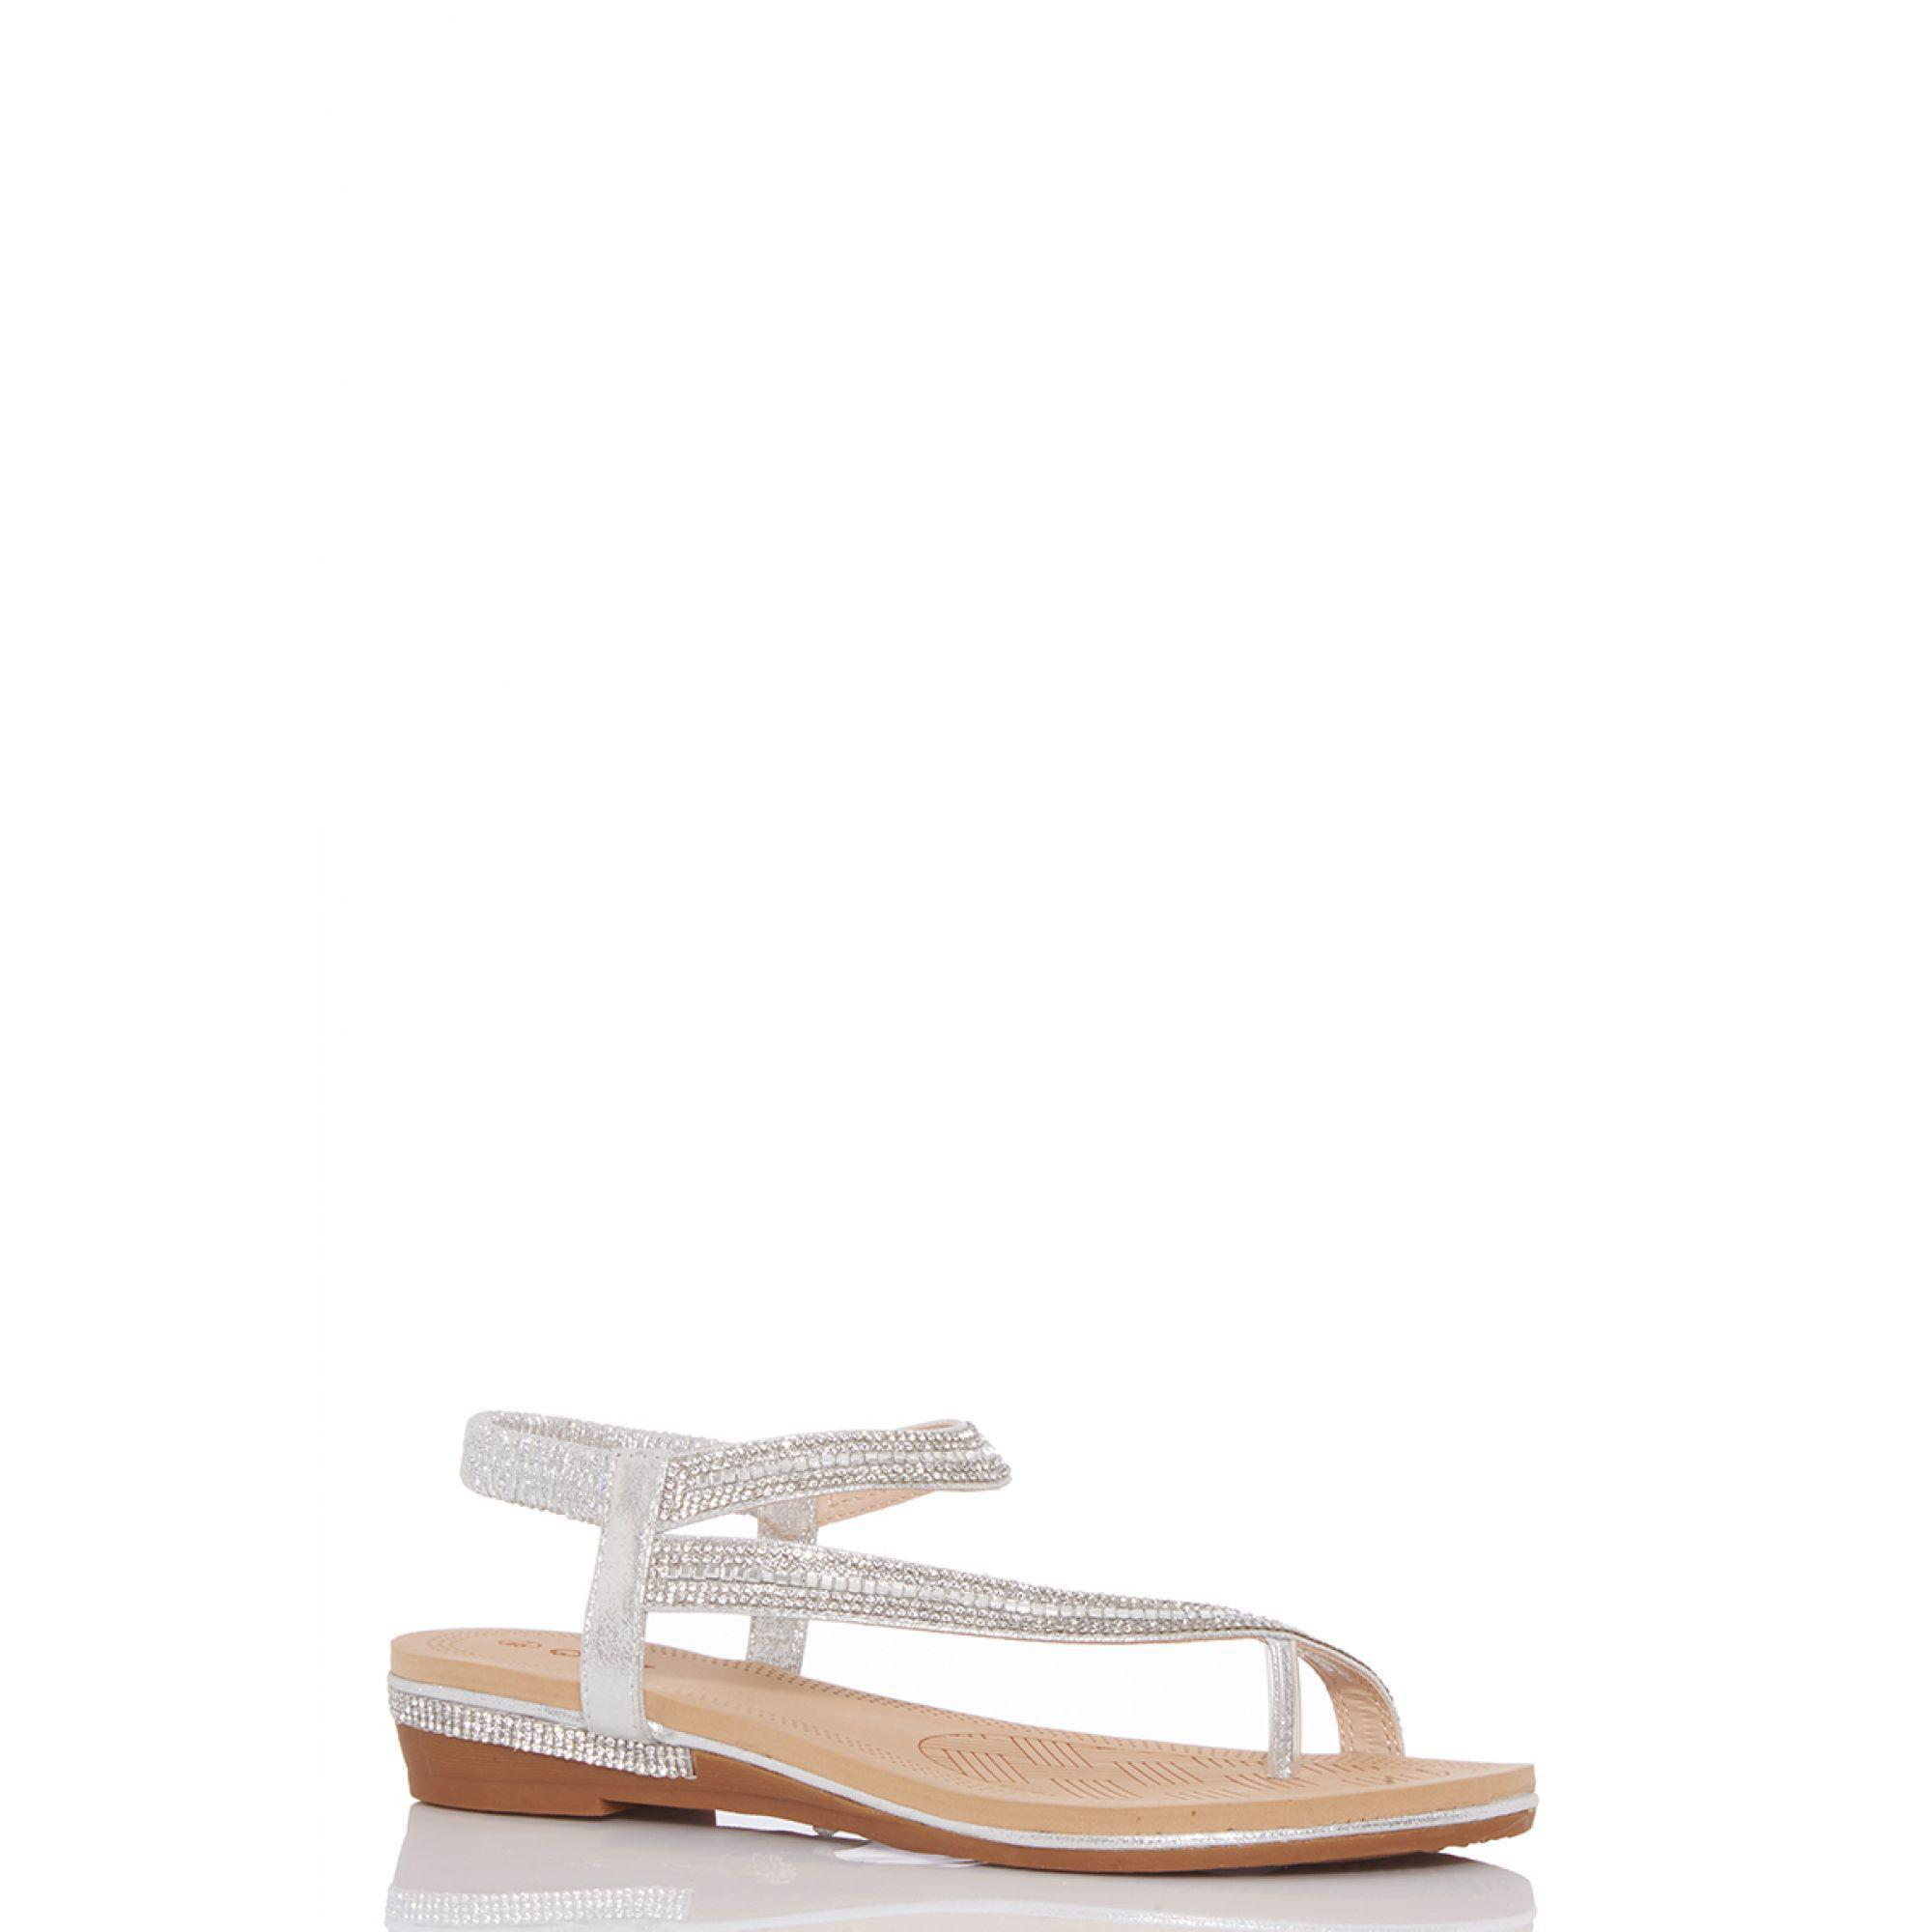 db0fd237dee1 Quiz - Metallic Silver Diamante Slant Strap Flat Sandals - Lyst. View  fullscreen